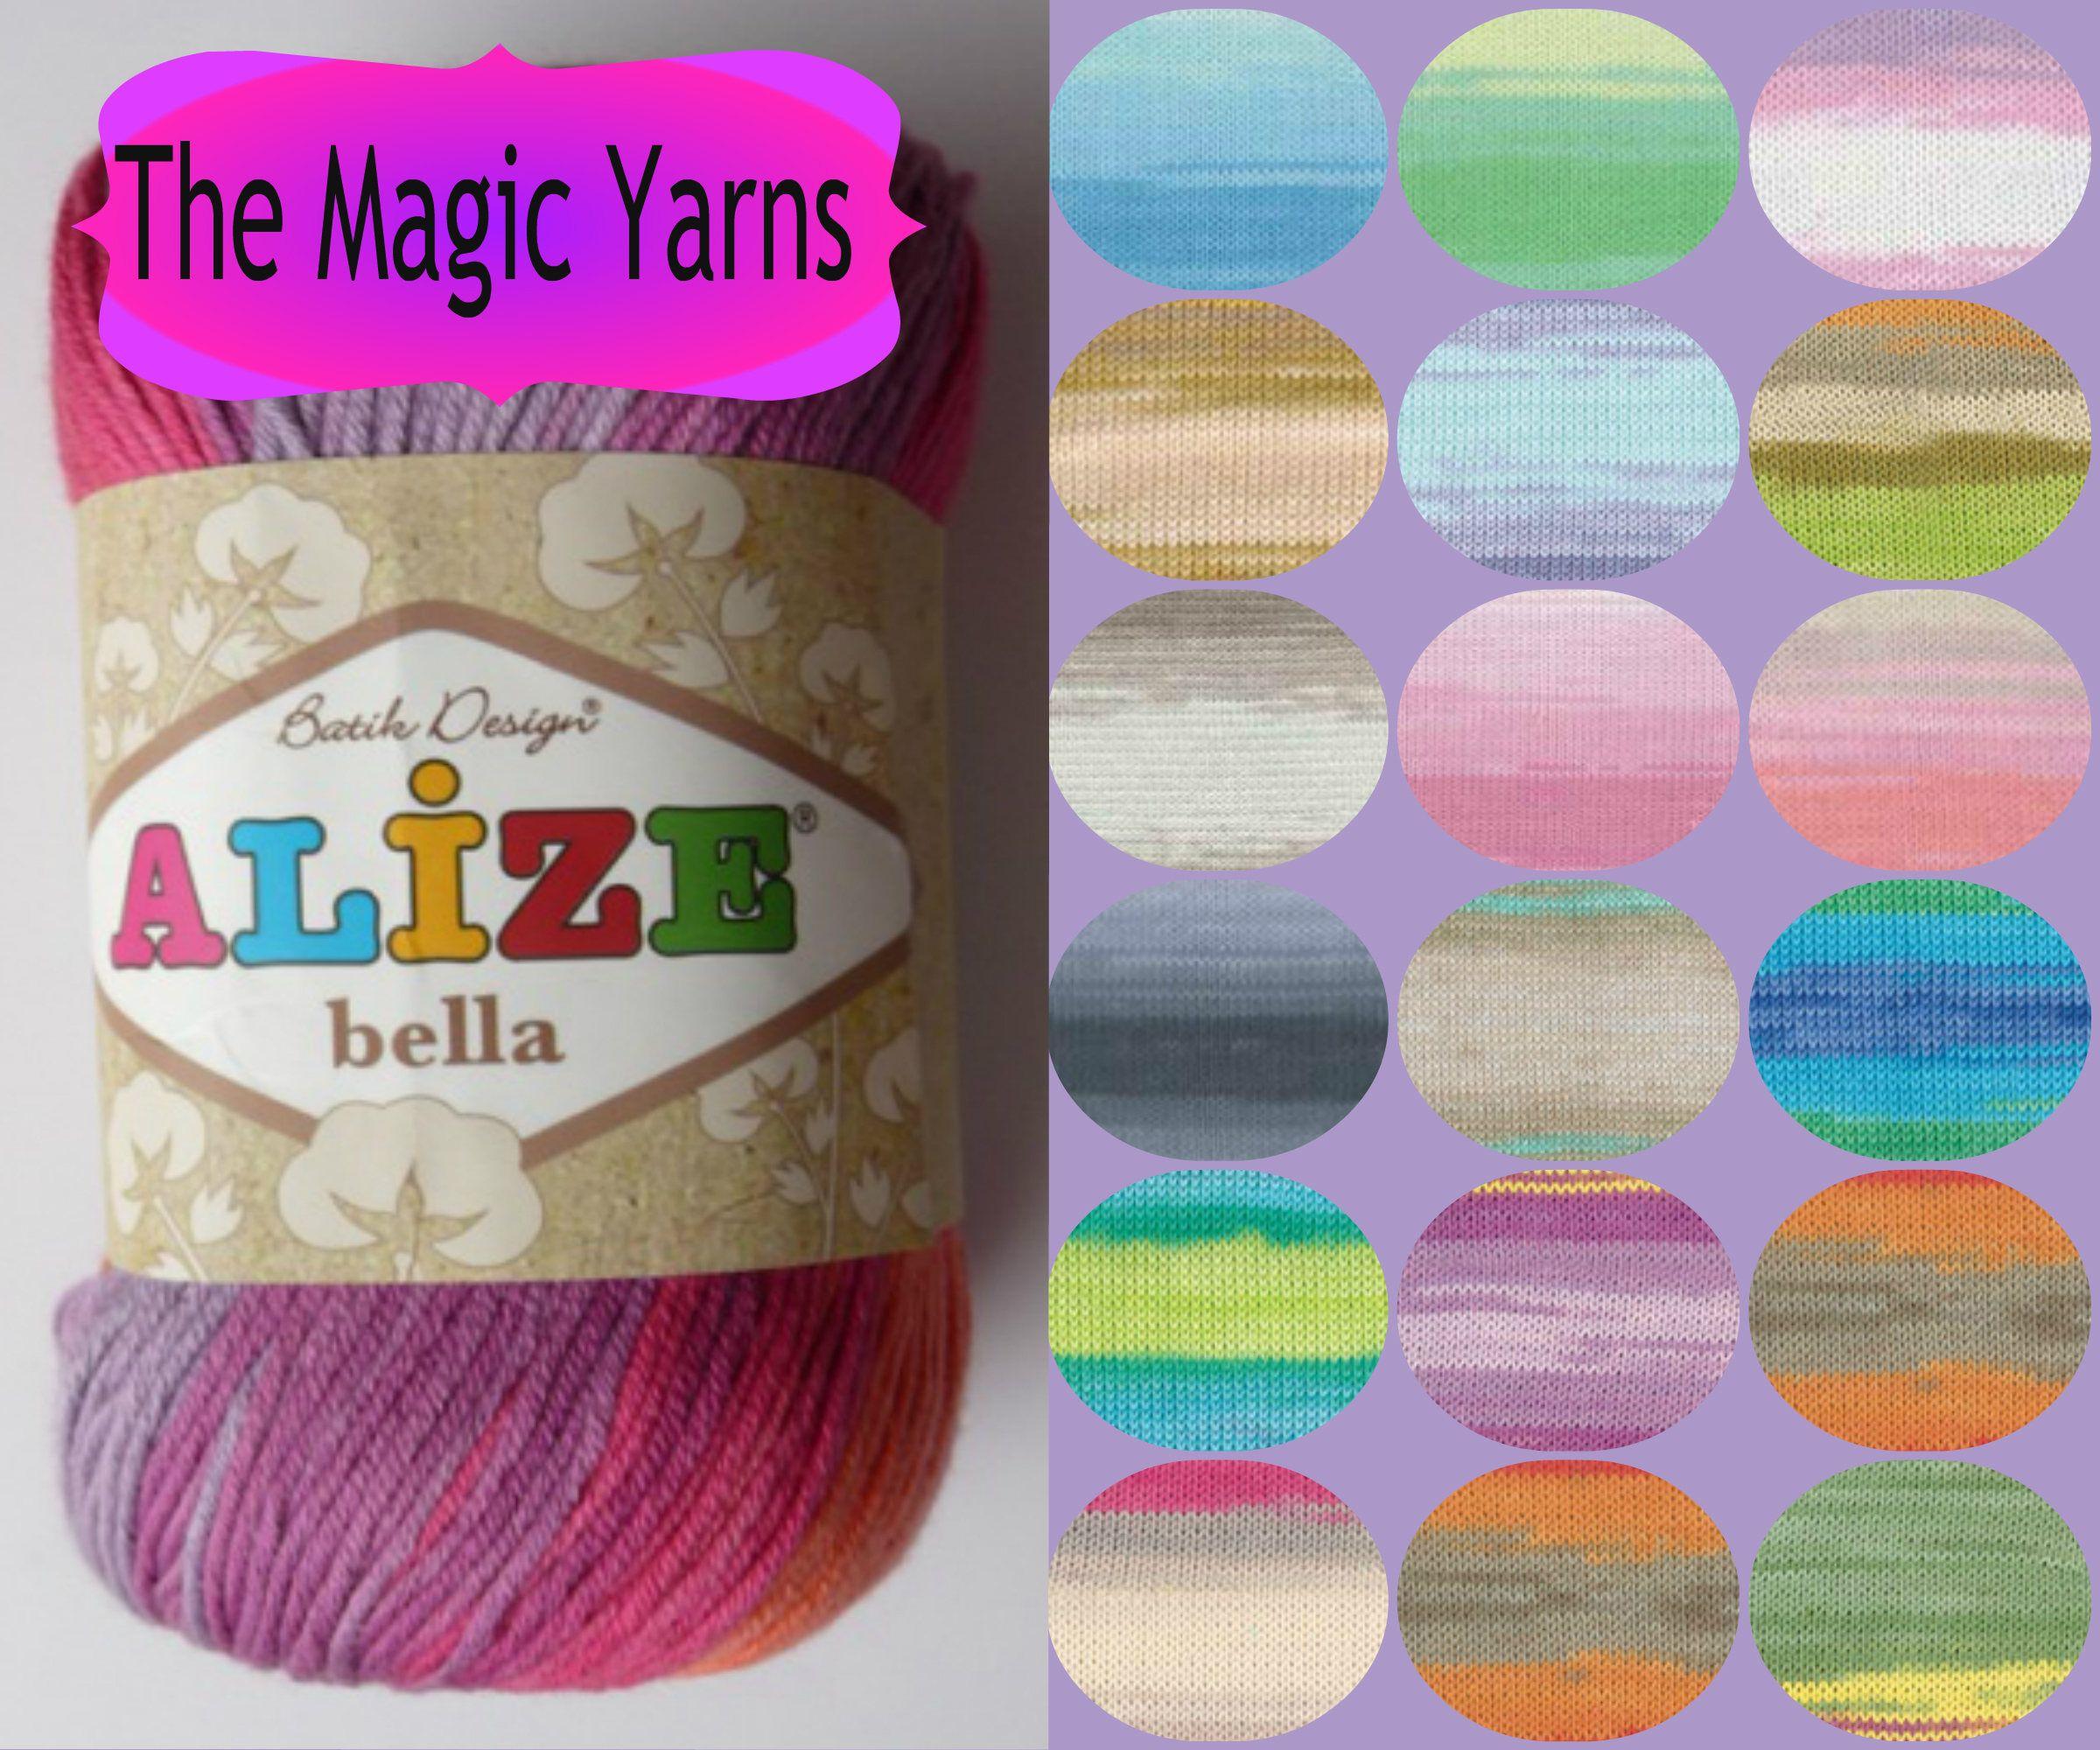 Natural Cotton Yarn,ALIZE BELLA BATIK 100% Pure Cotton